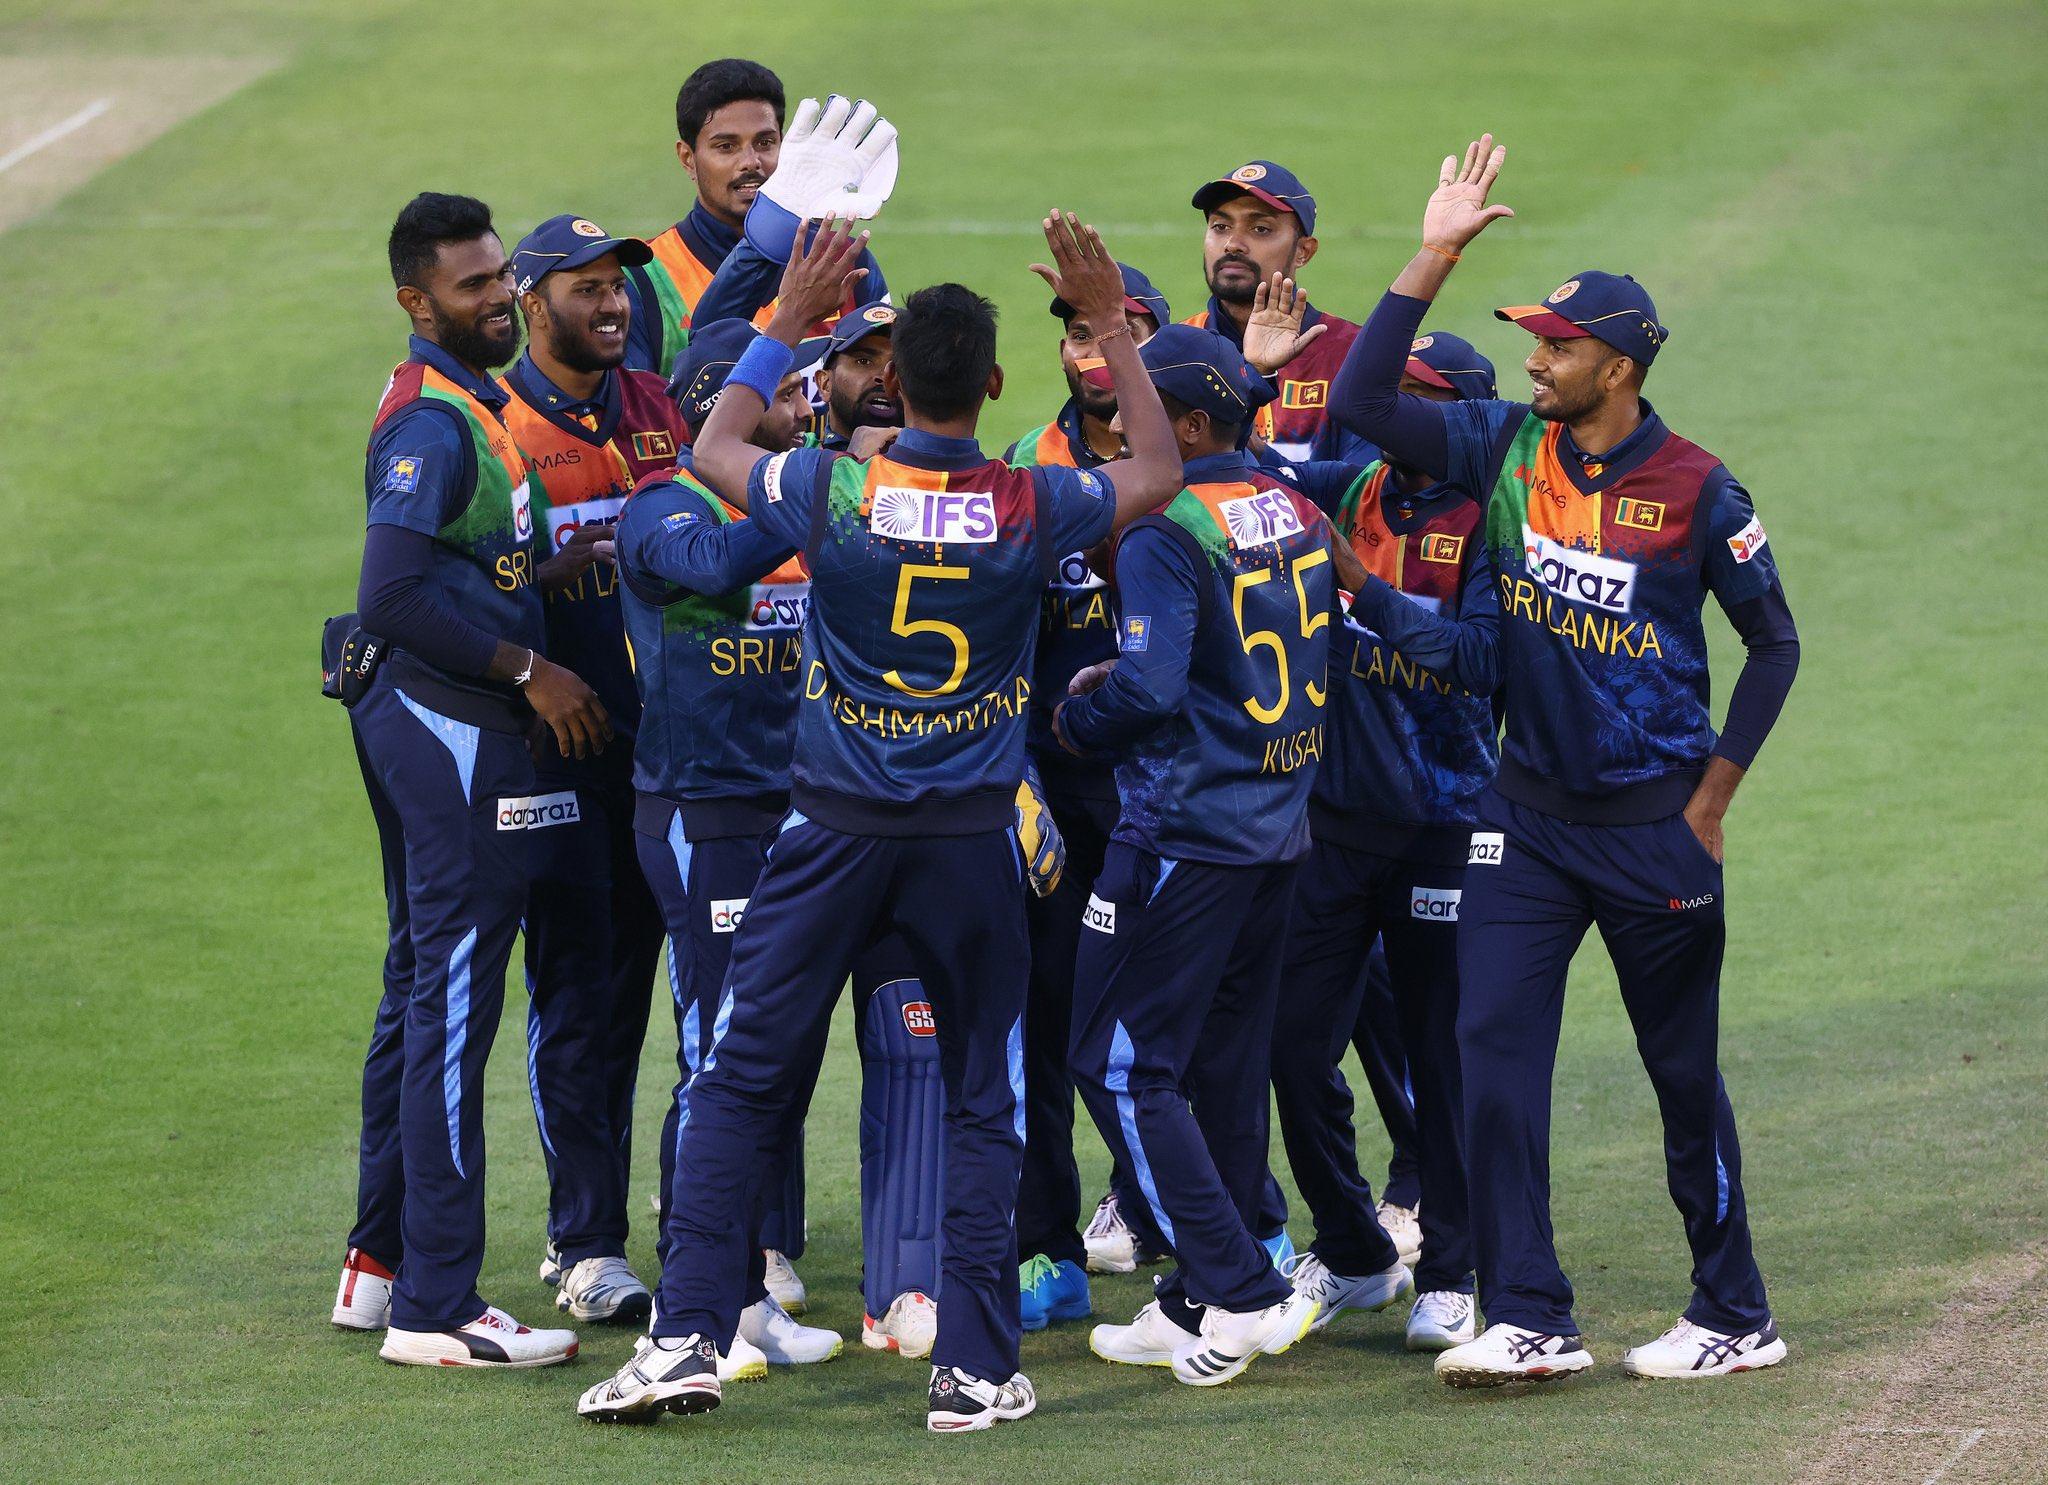 5th consecutive T20I series loss for Sri Lanka